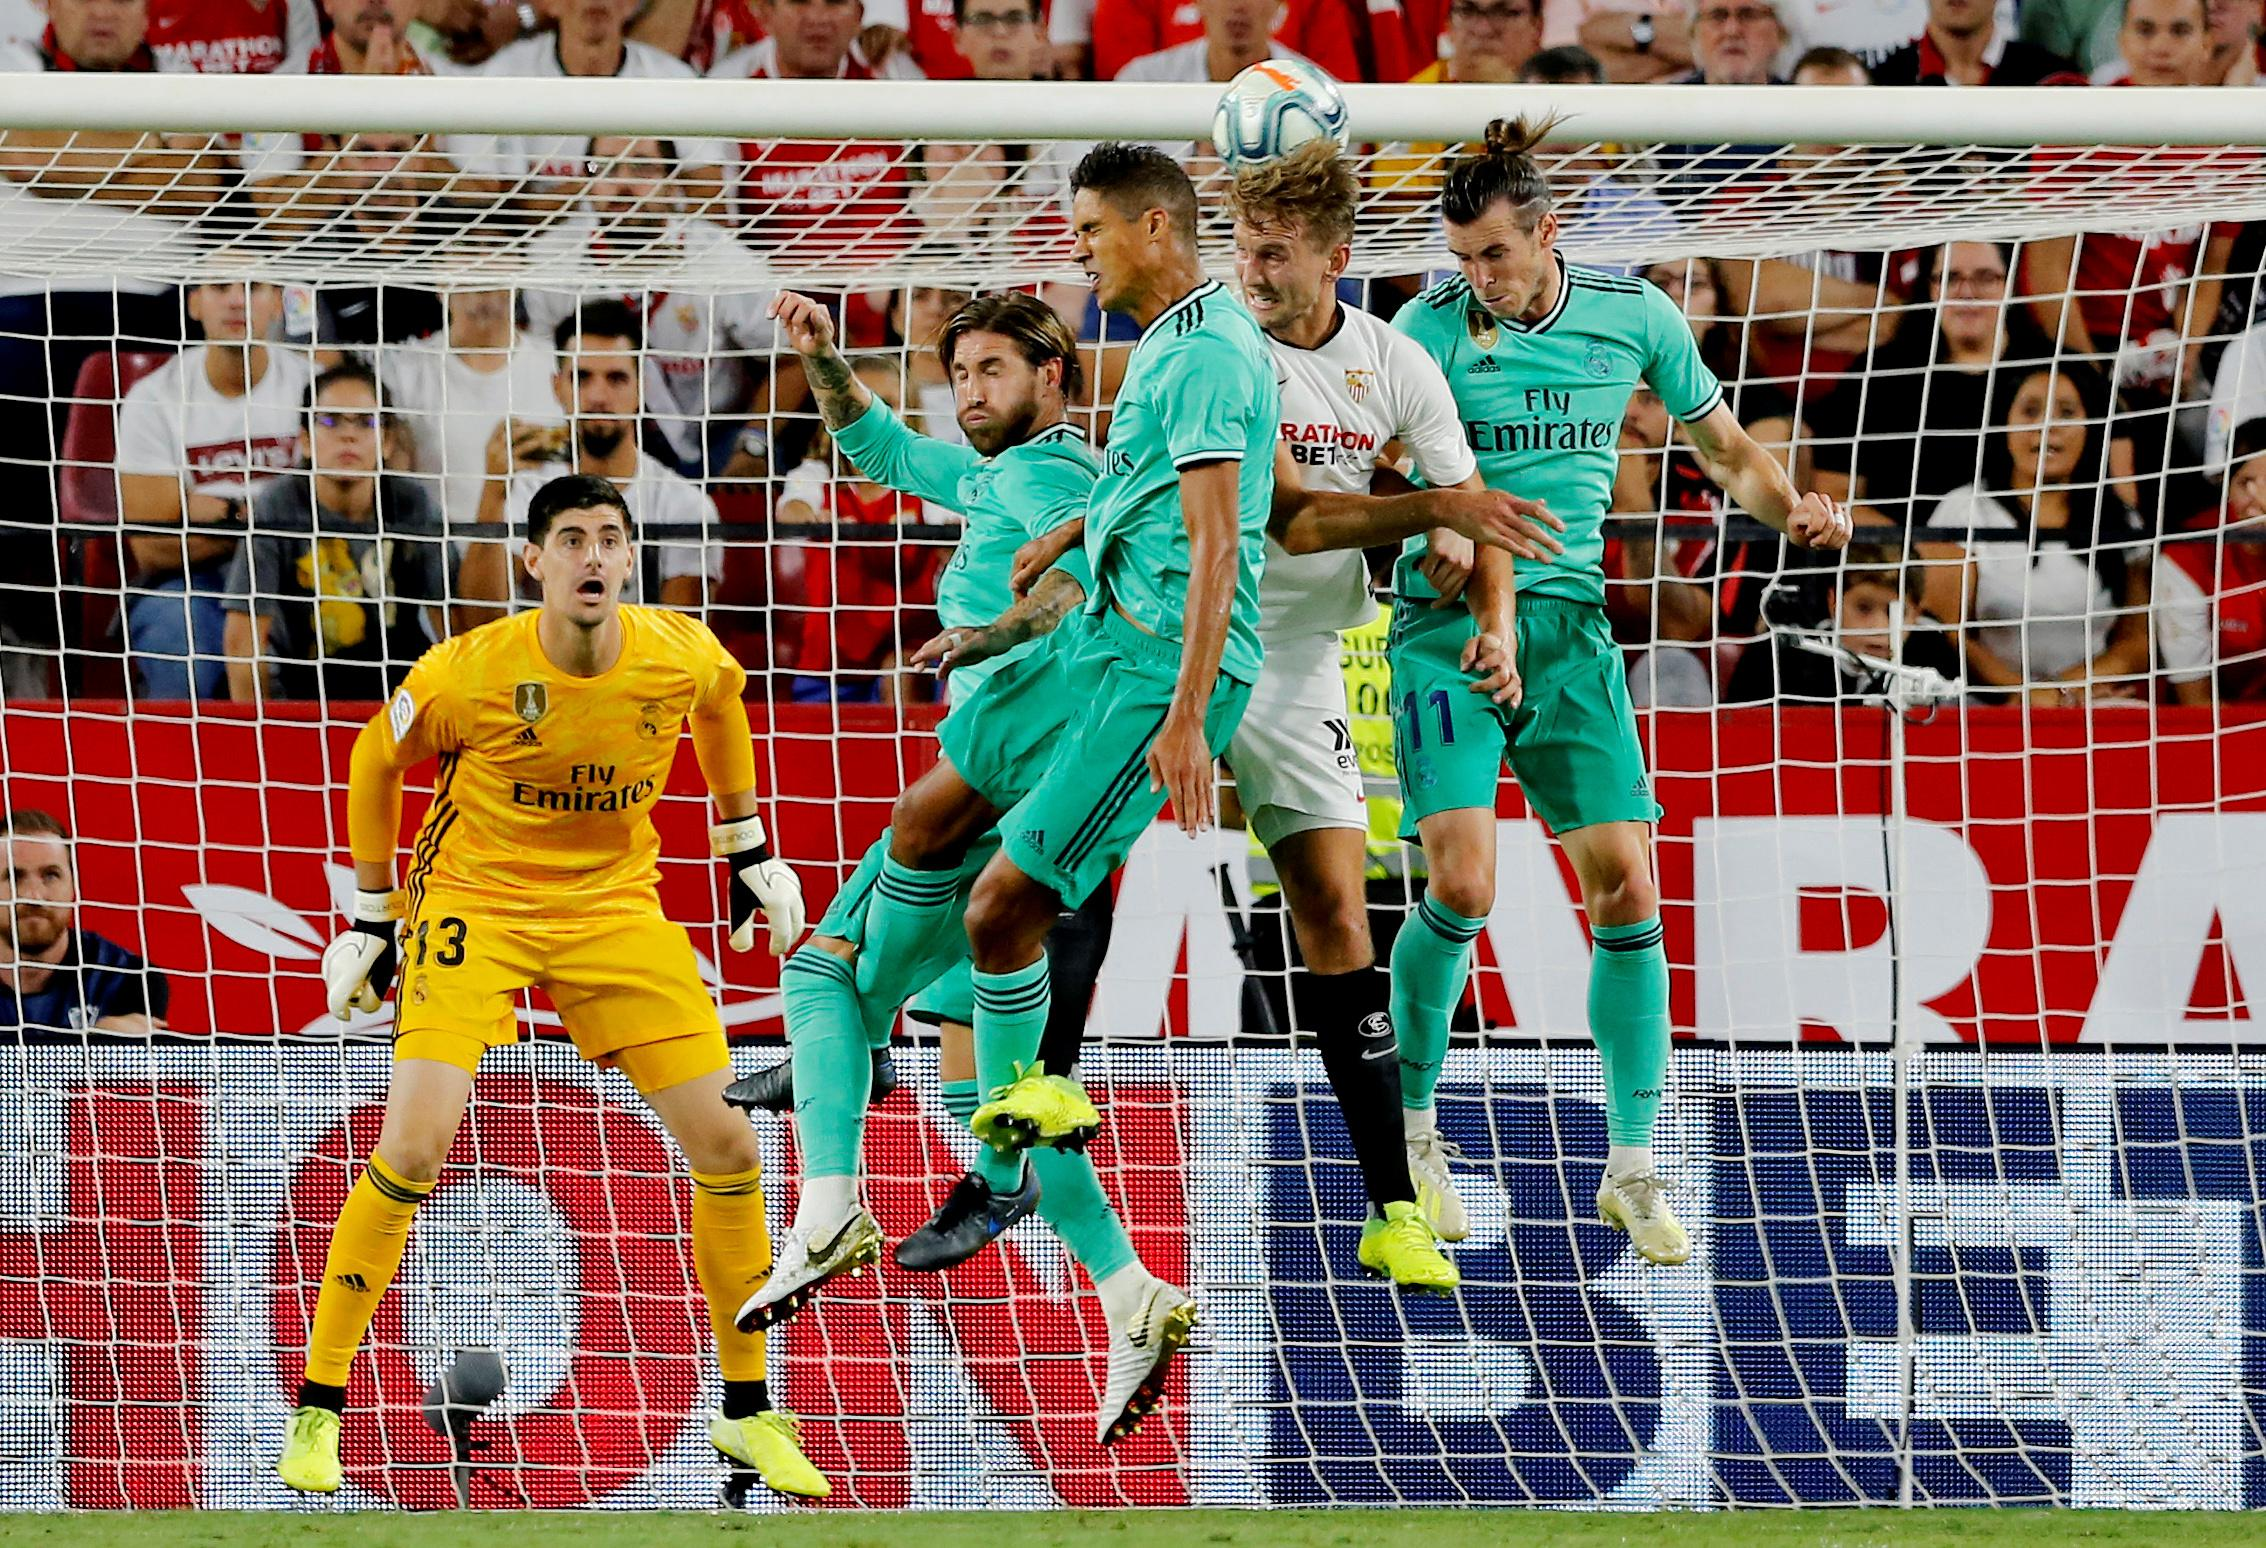 Benzema header beats Sevilla and breathes life back into Real